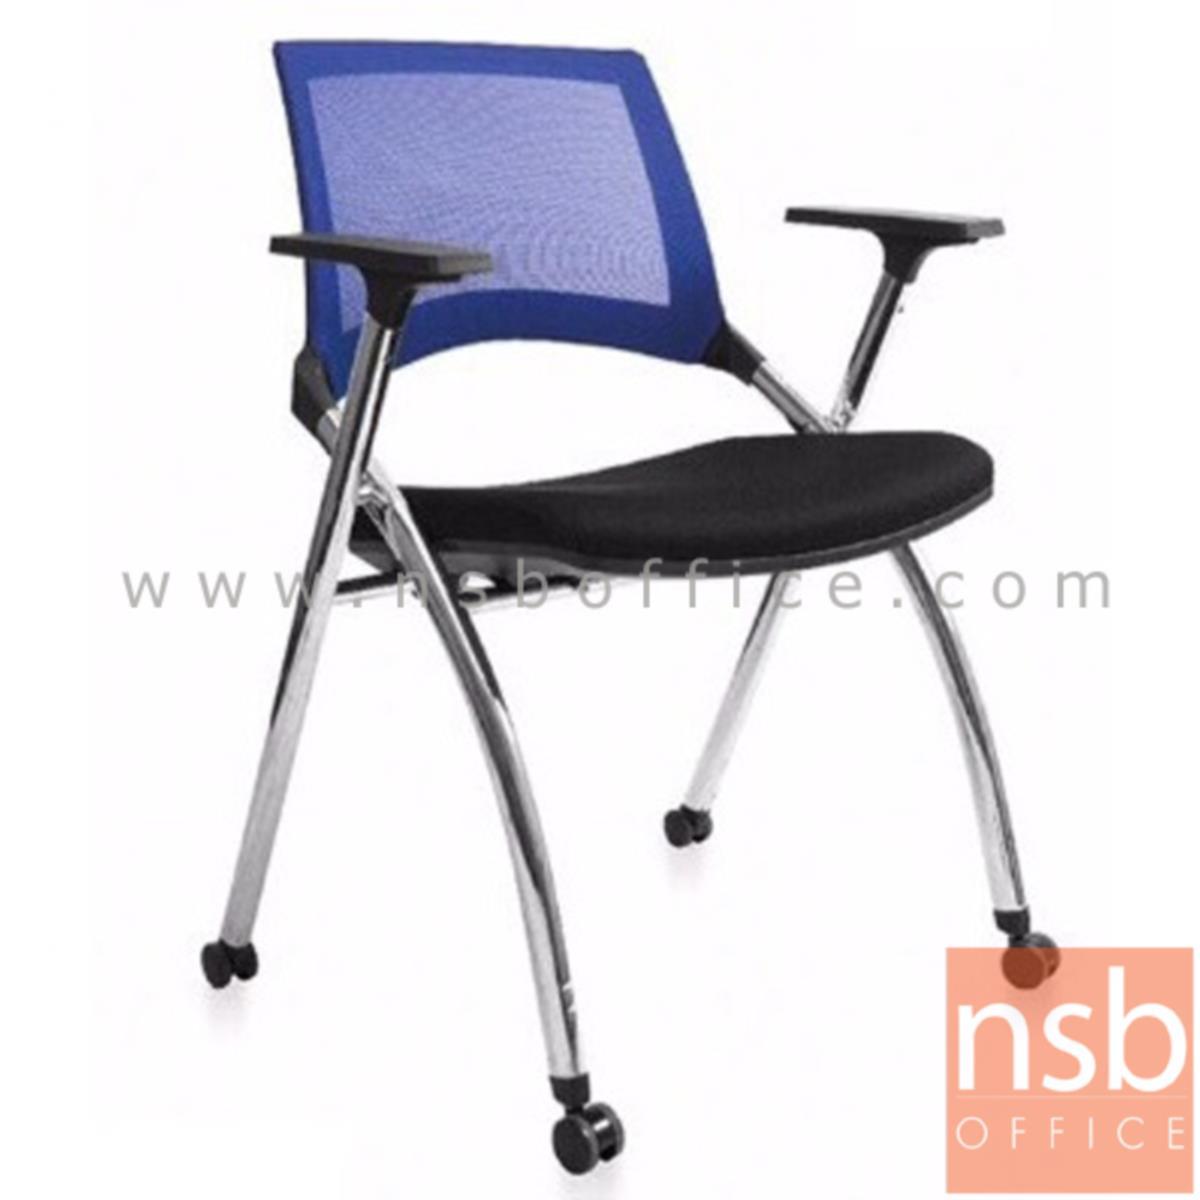 B28A076:เก้าอี้สำนักงานหลังเน็ต รุ่น Nighstisters  ขาเหล็กชุบโครเมี่ยม